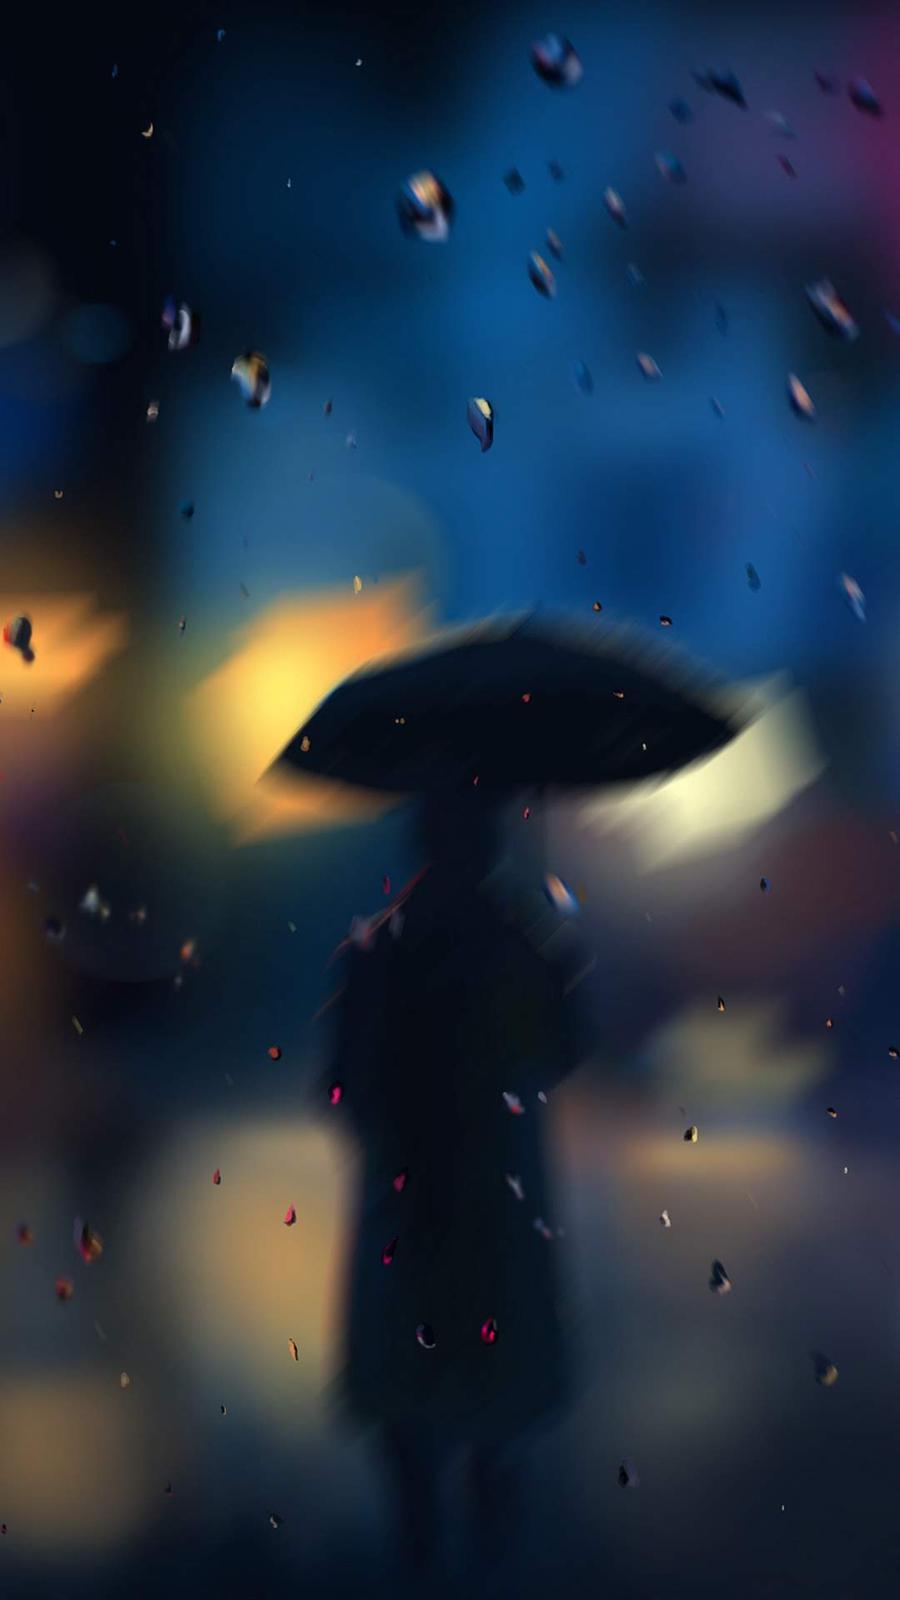 Rain Wallpapers Free Download